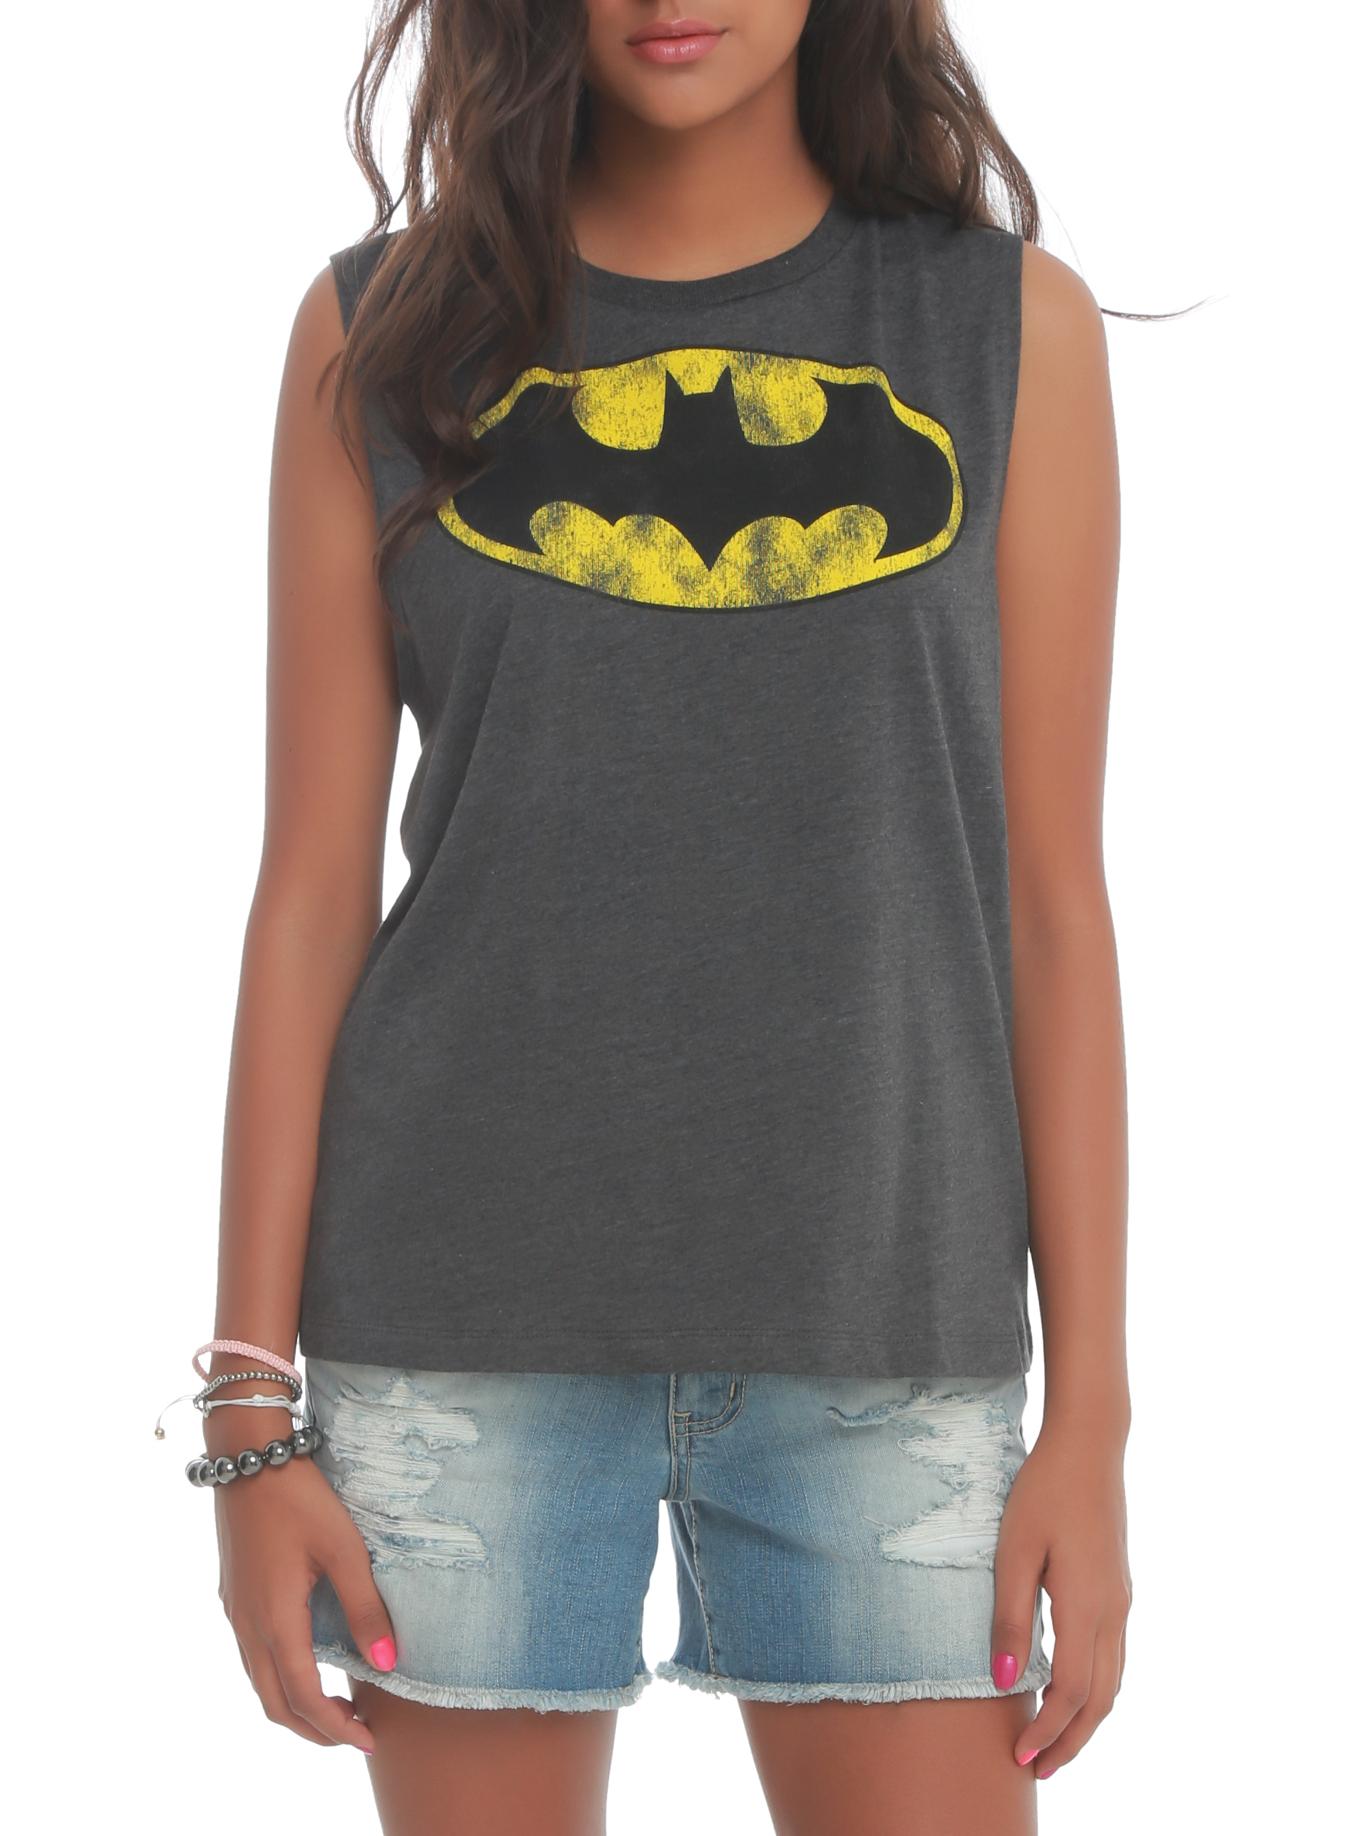 DC Comics Batman Striped Muscle Girls Top   Hot Topic